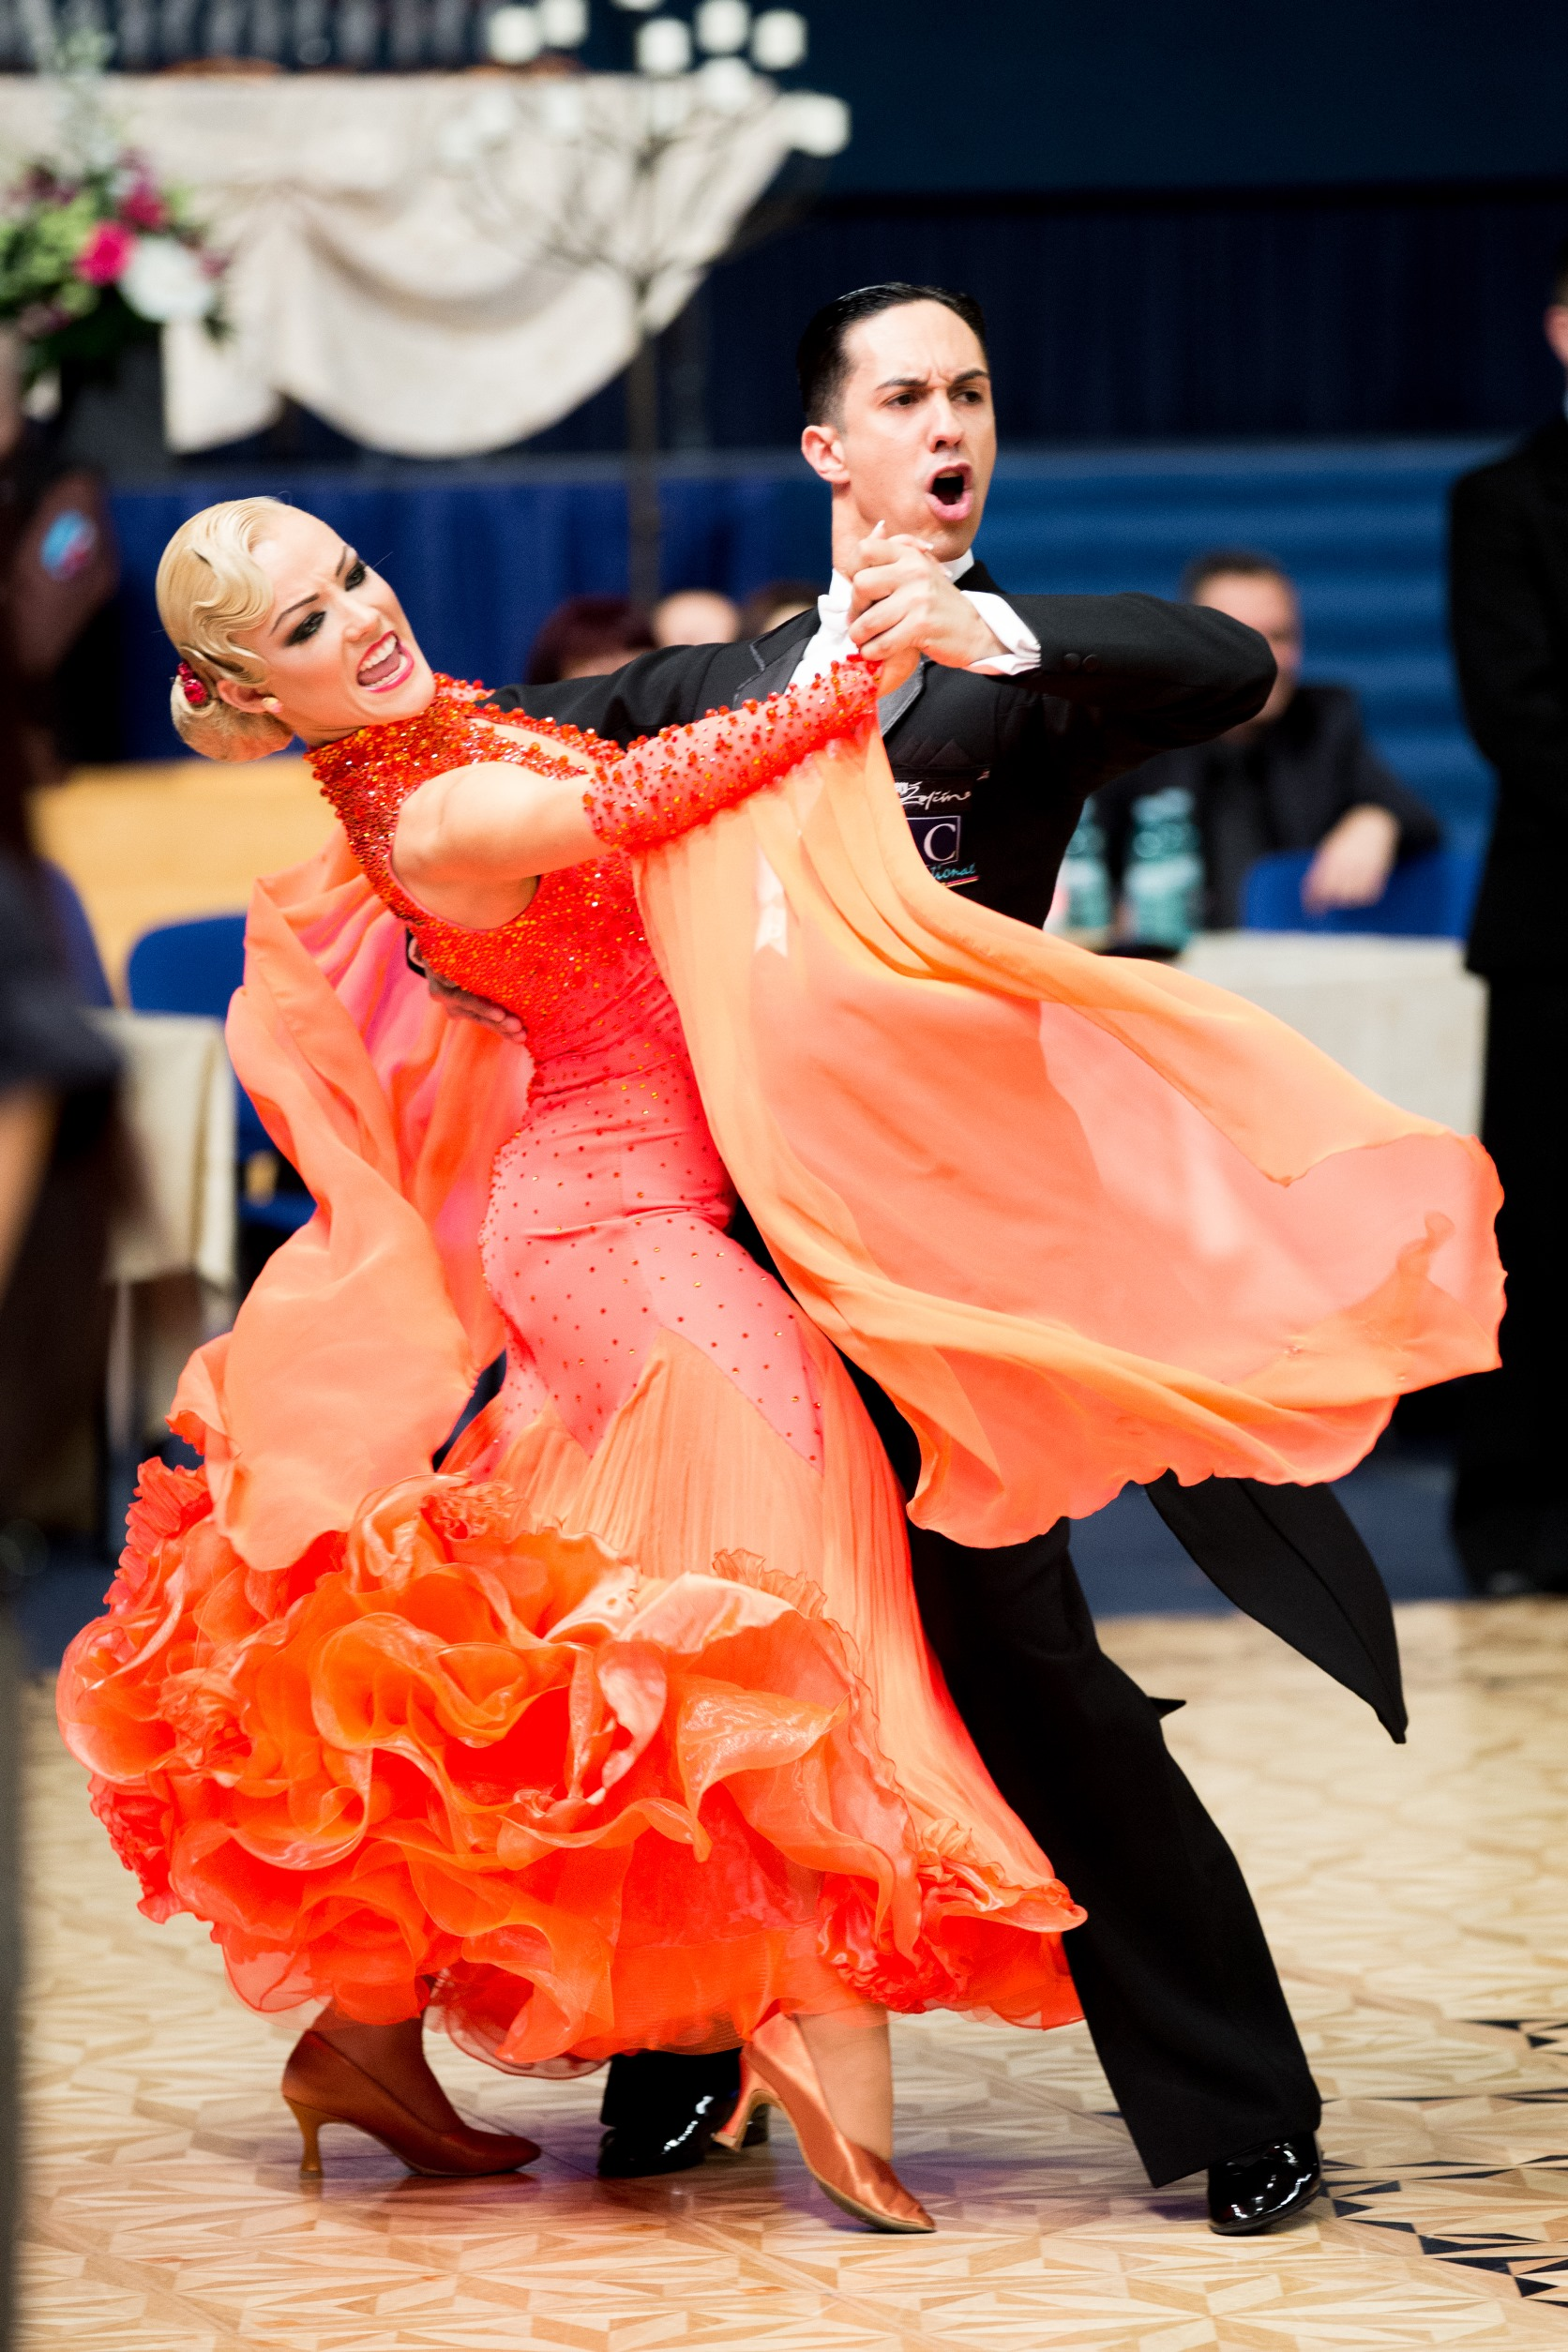 Emanuel Valeri & Tania Kehlet, photography- dancesportphoto.net